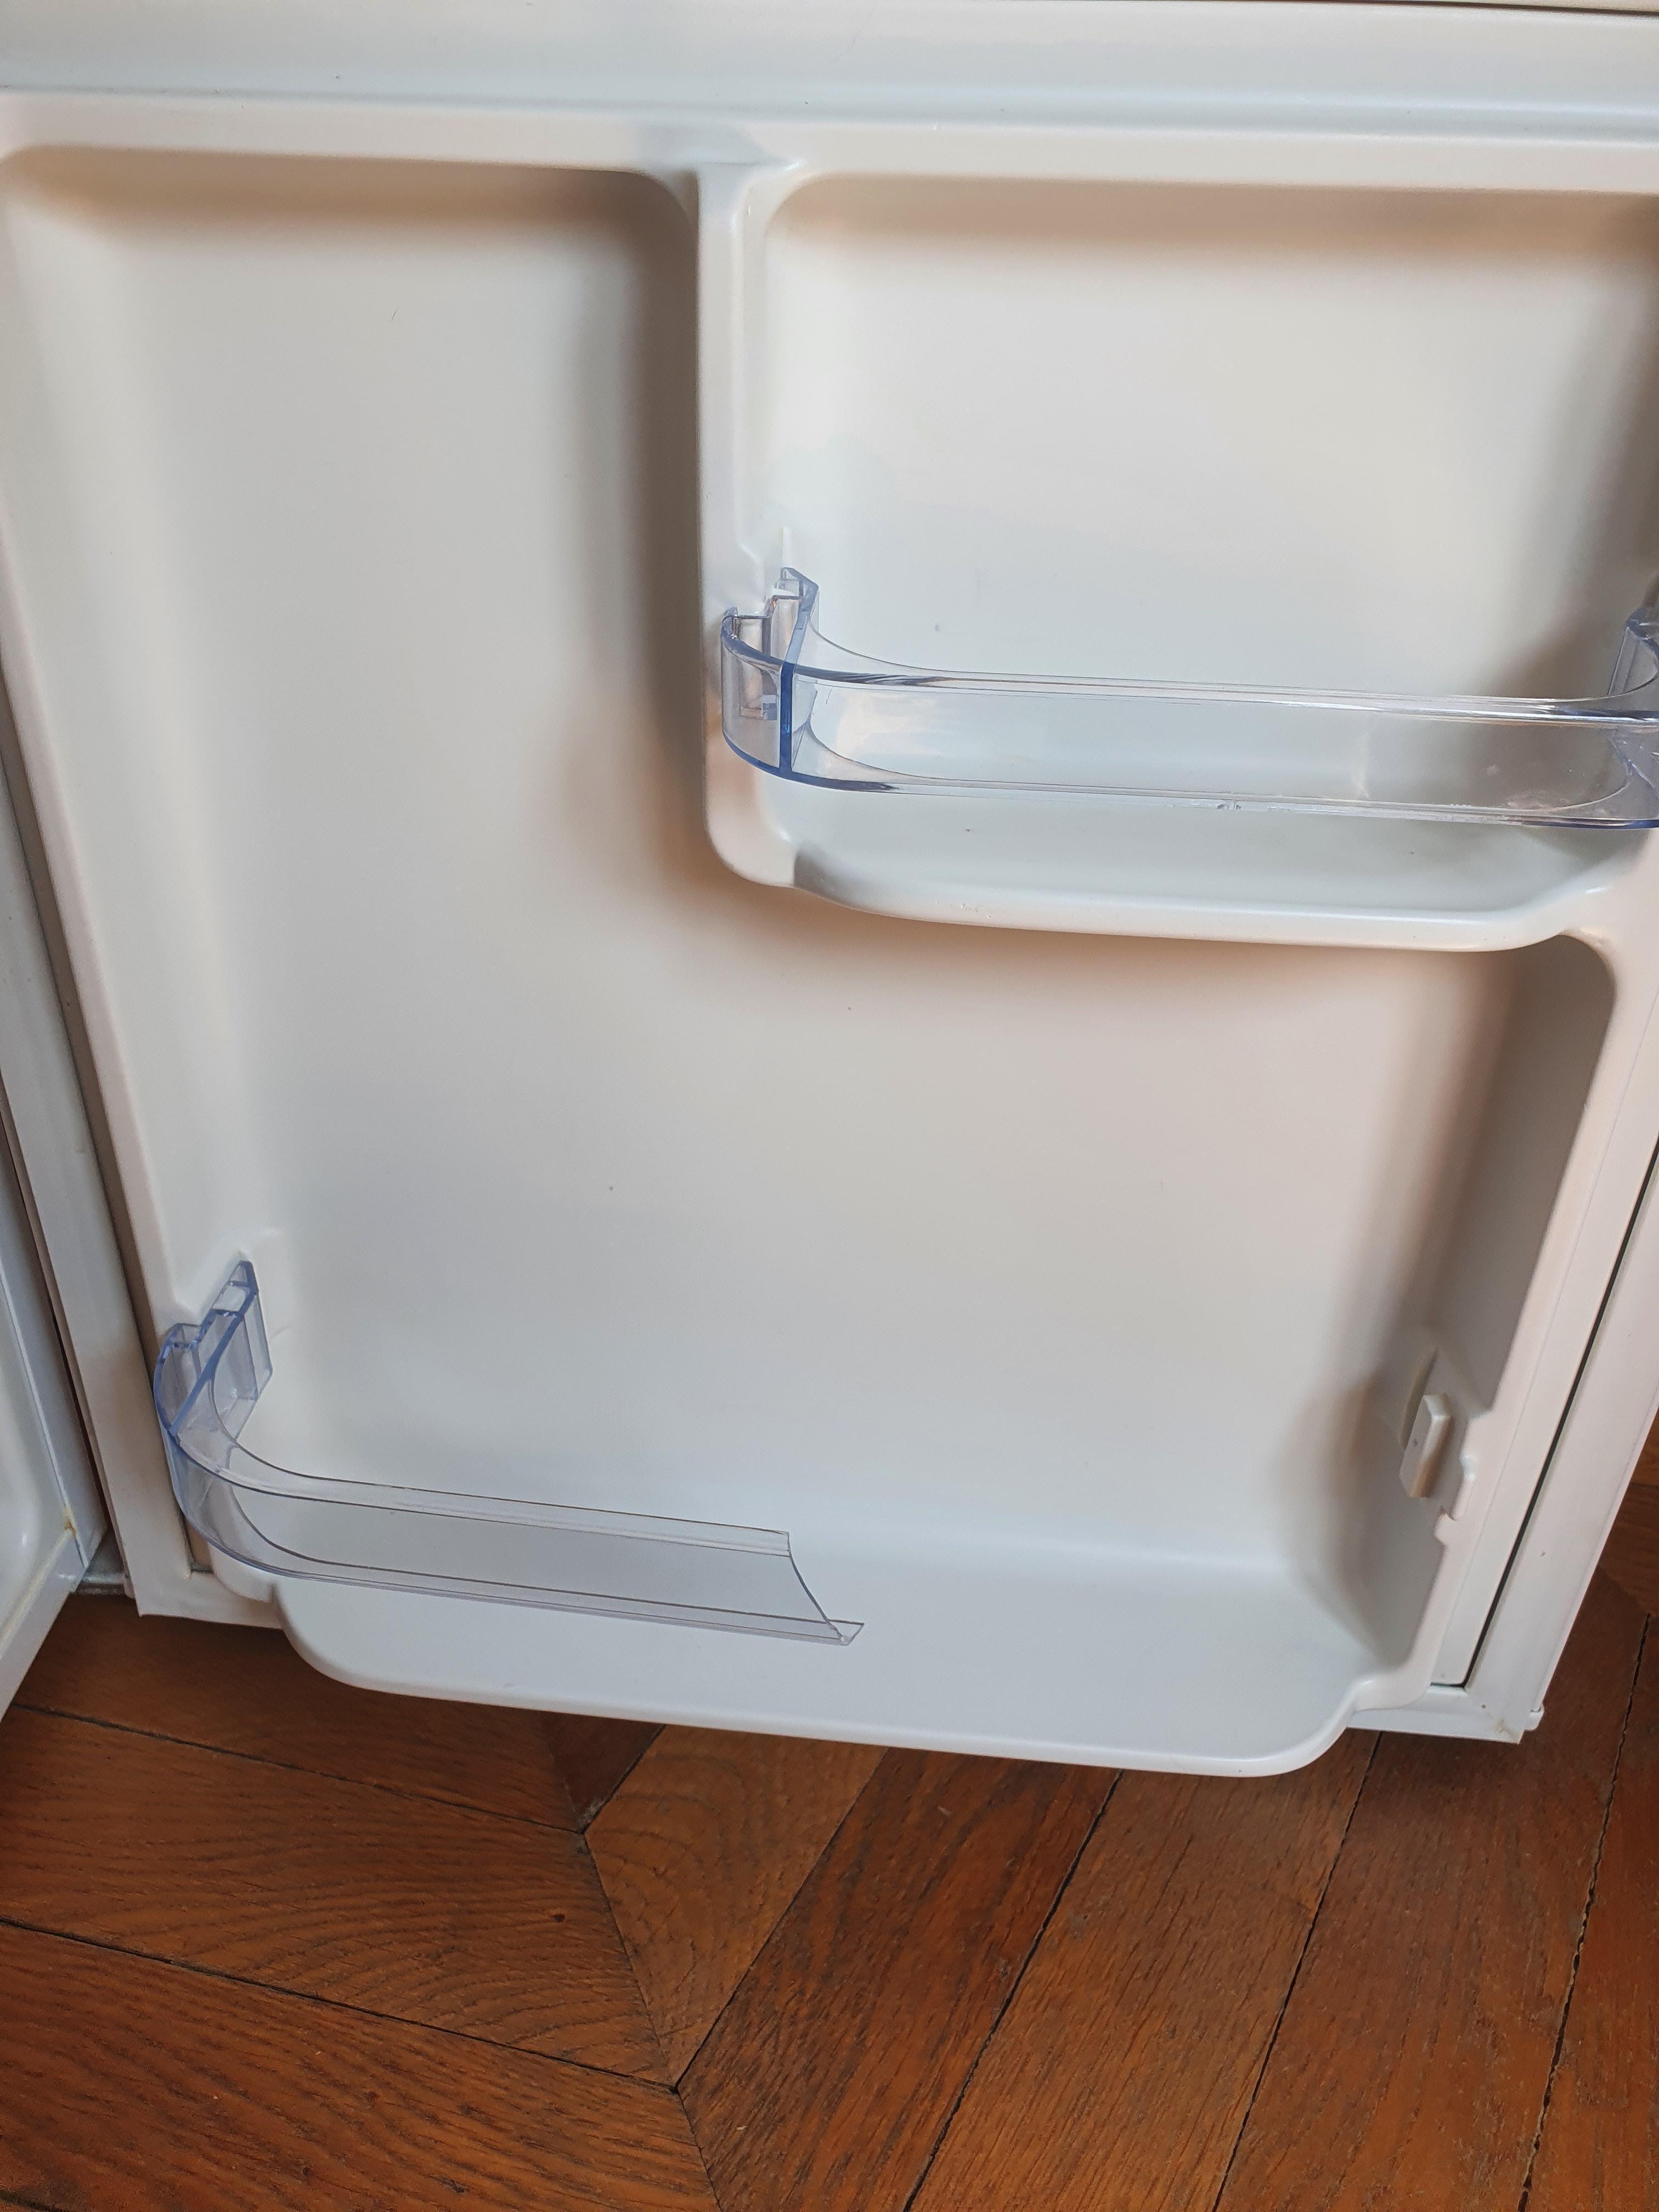 troc de troc donne mini frigo image 1